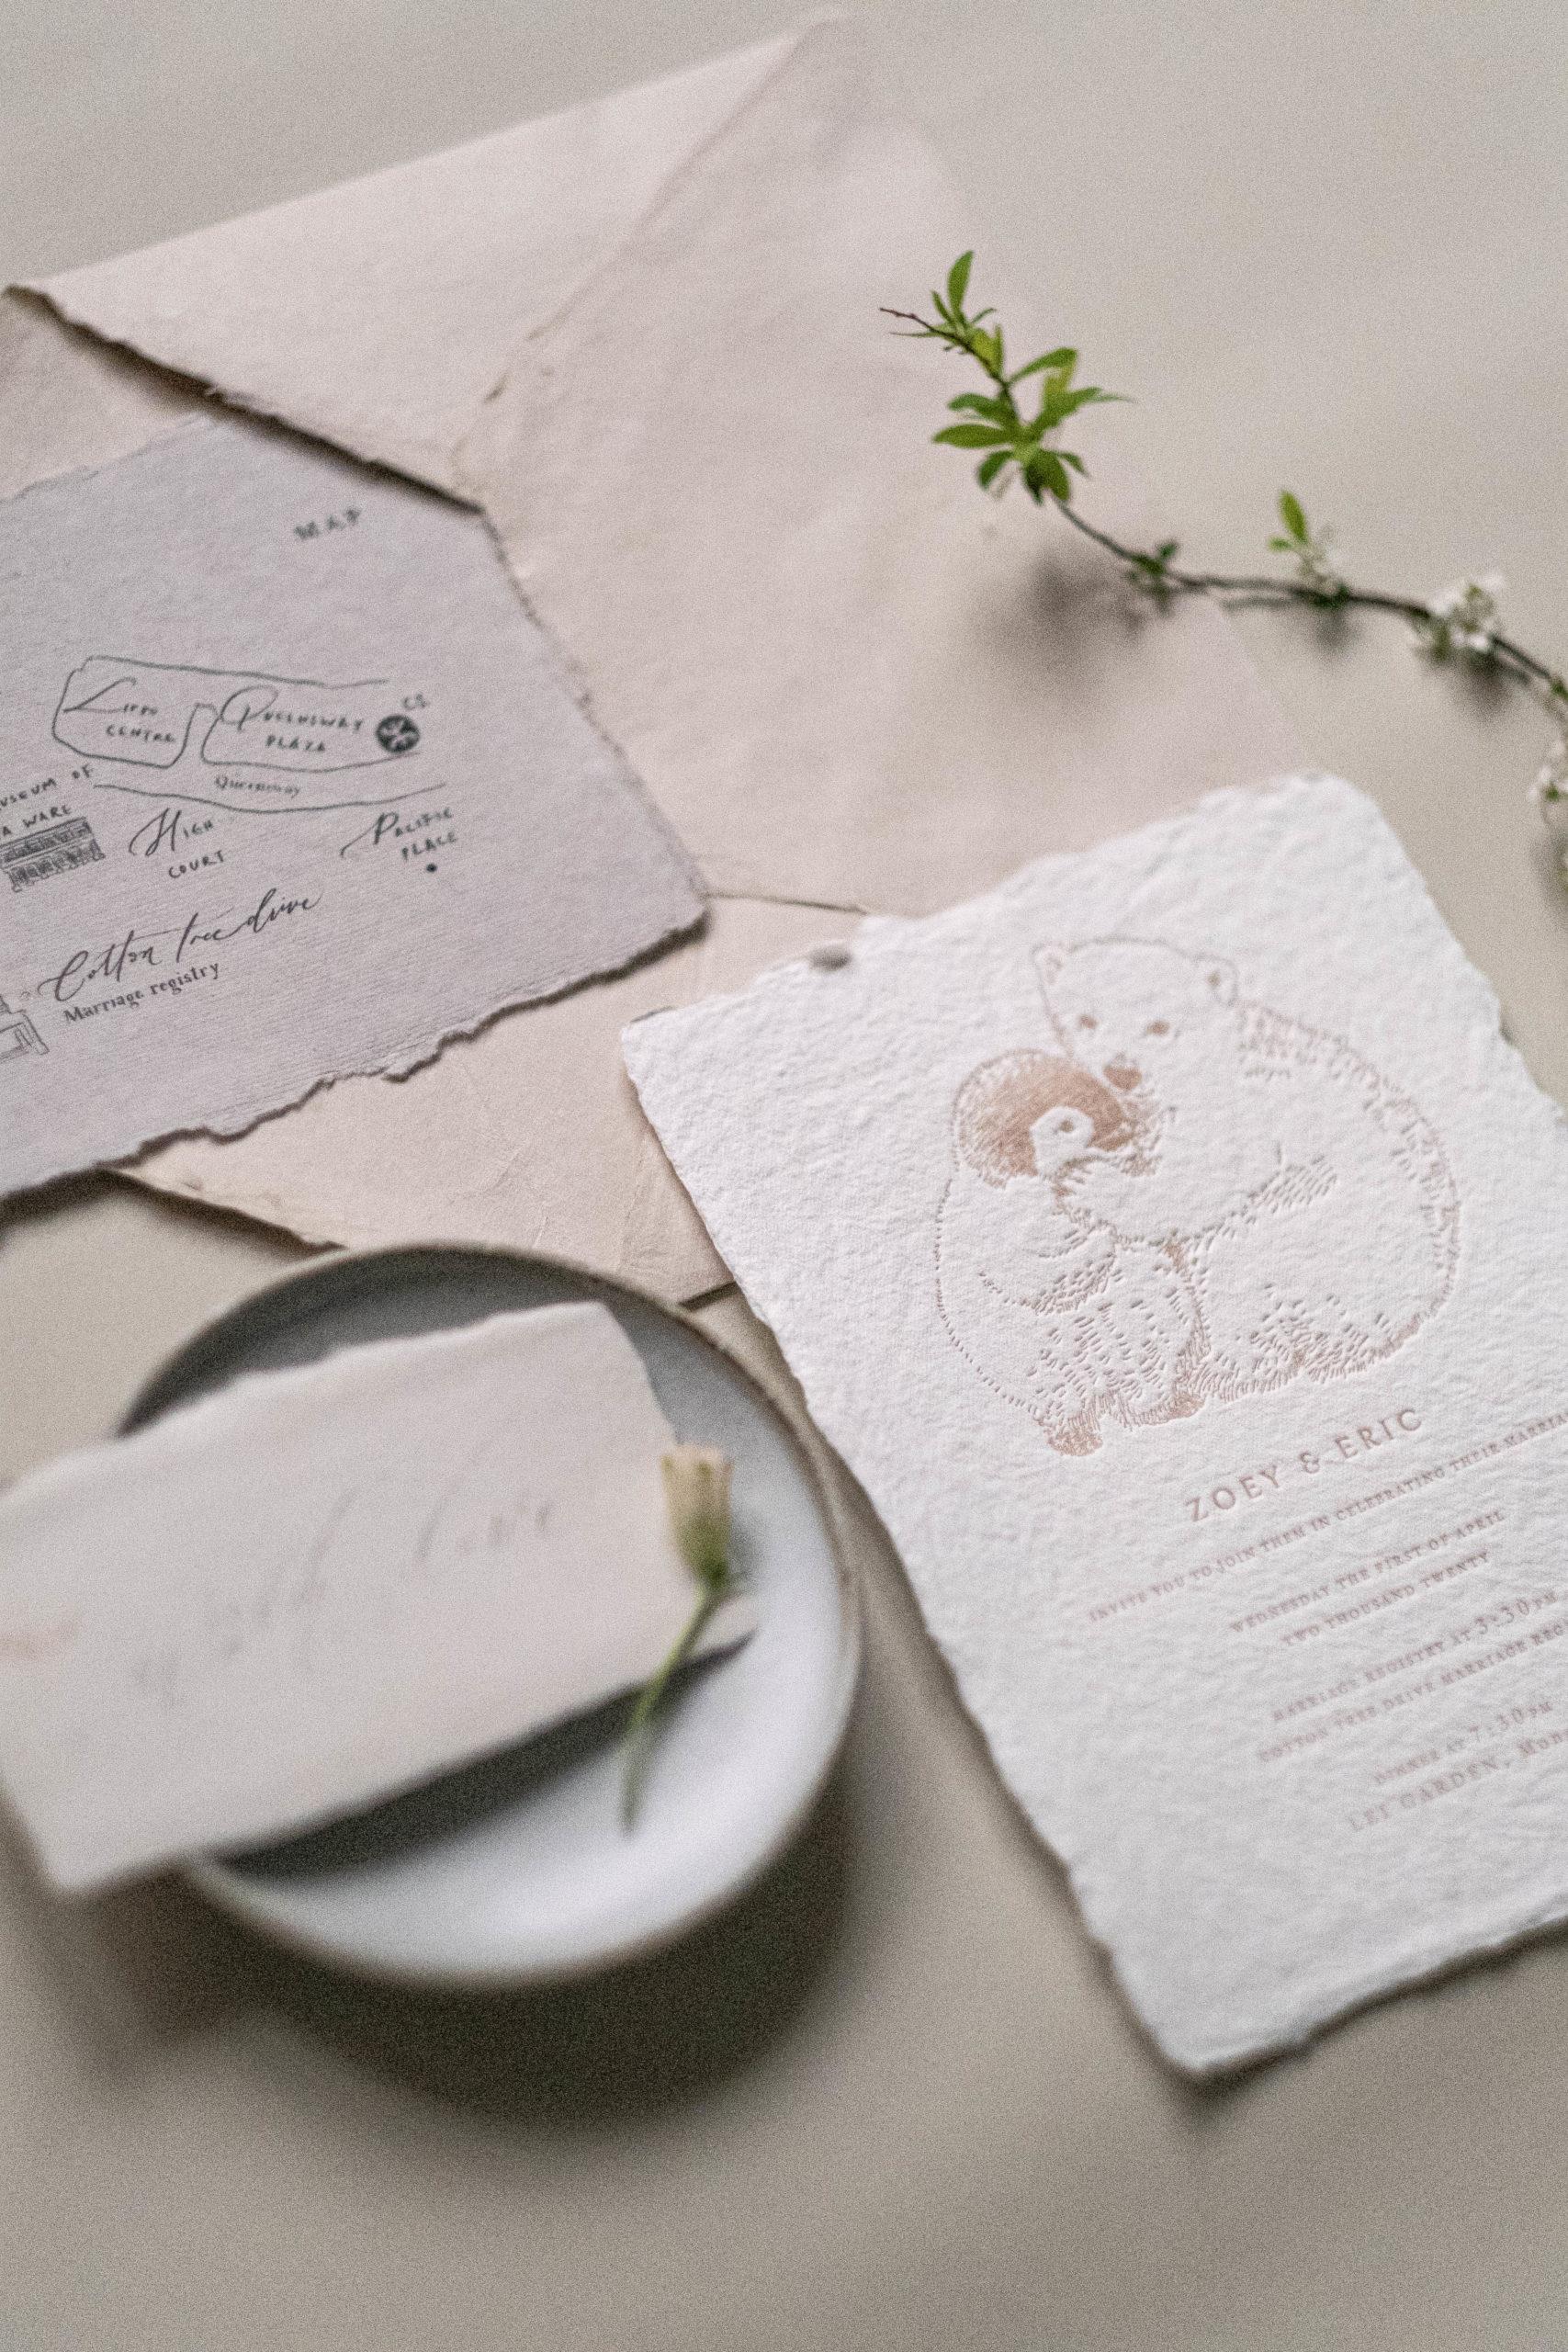 polar bear and penguin wedding suite in letterpress in blush color-cotton rag paper